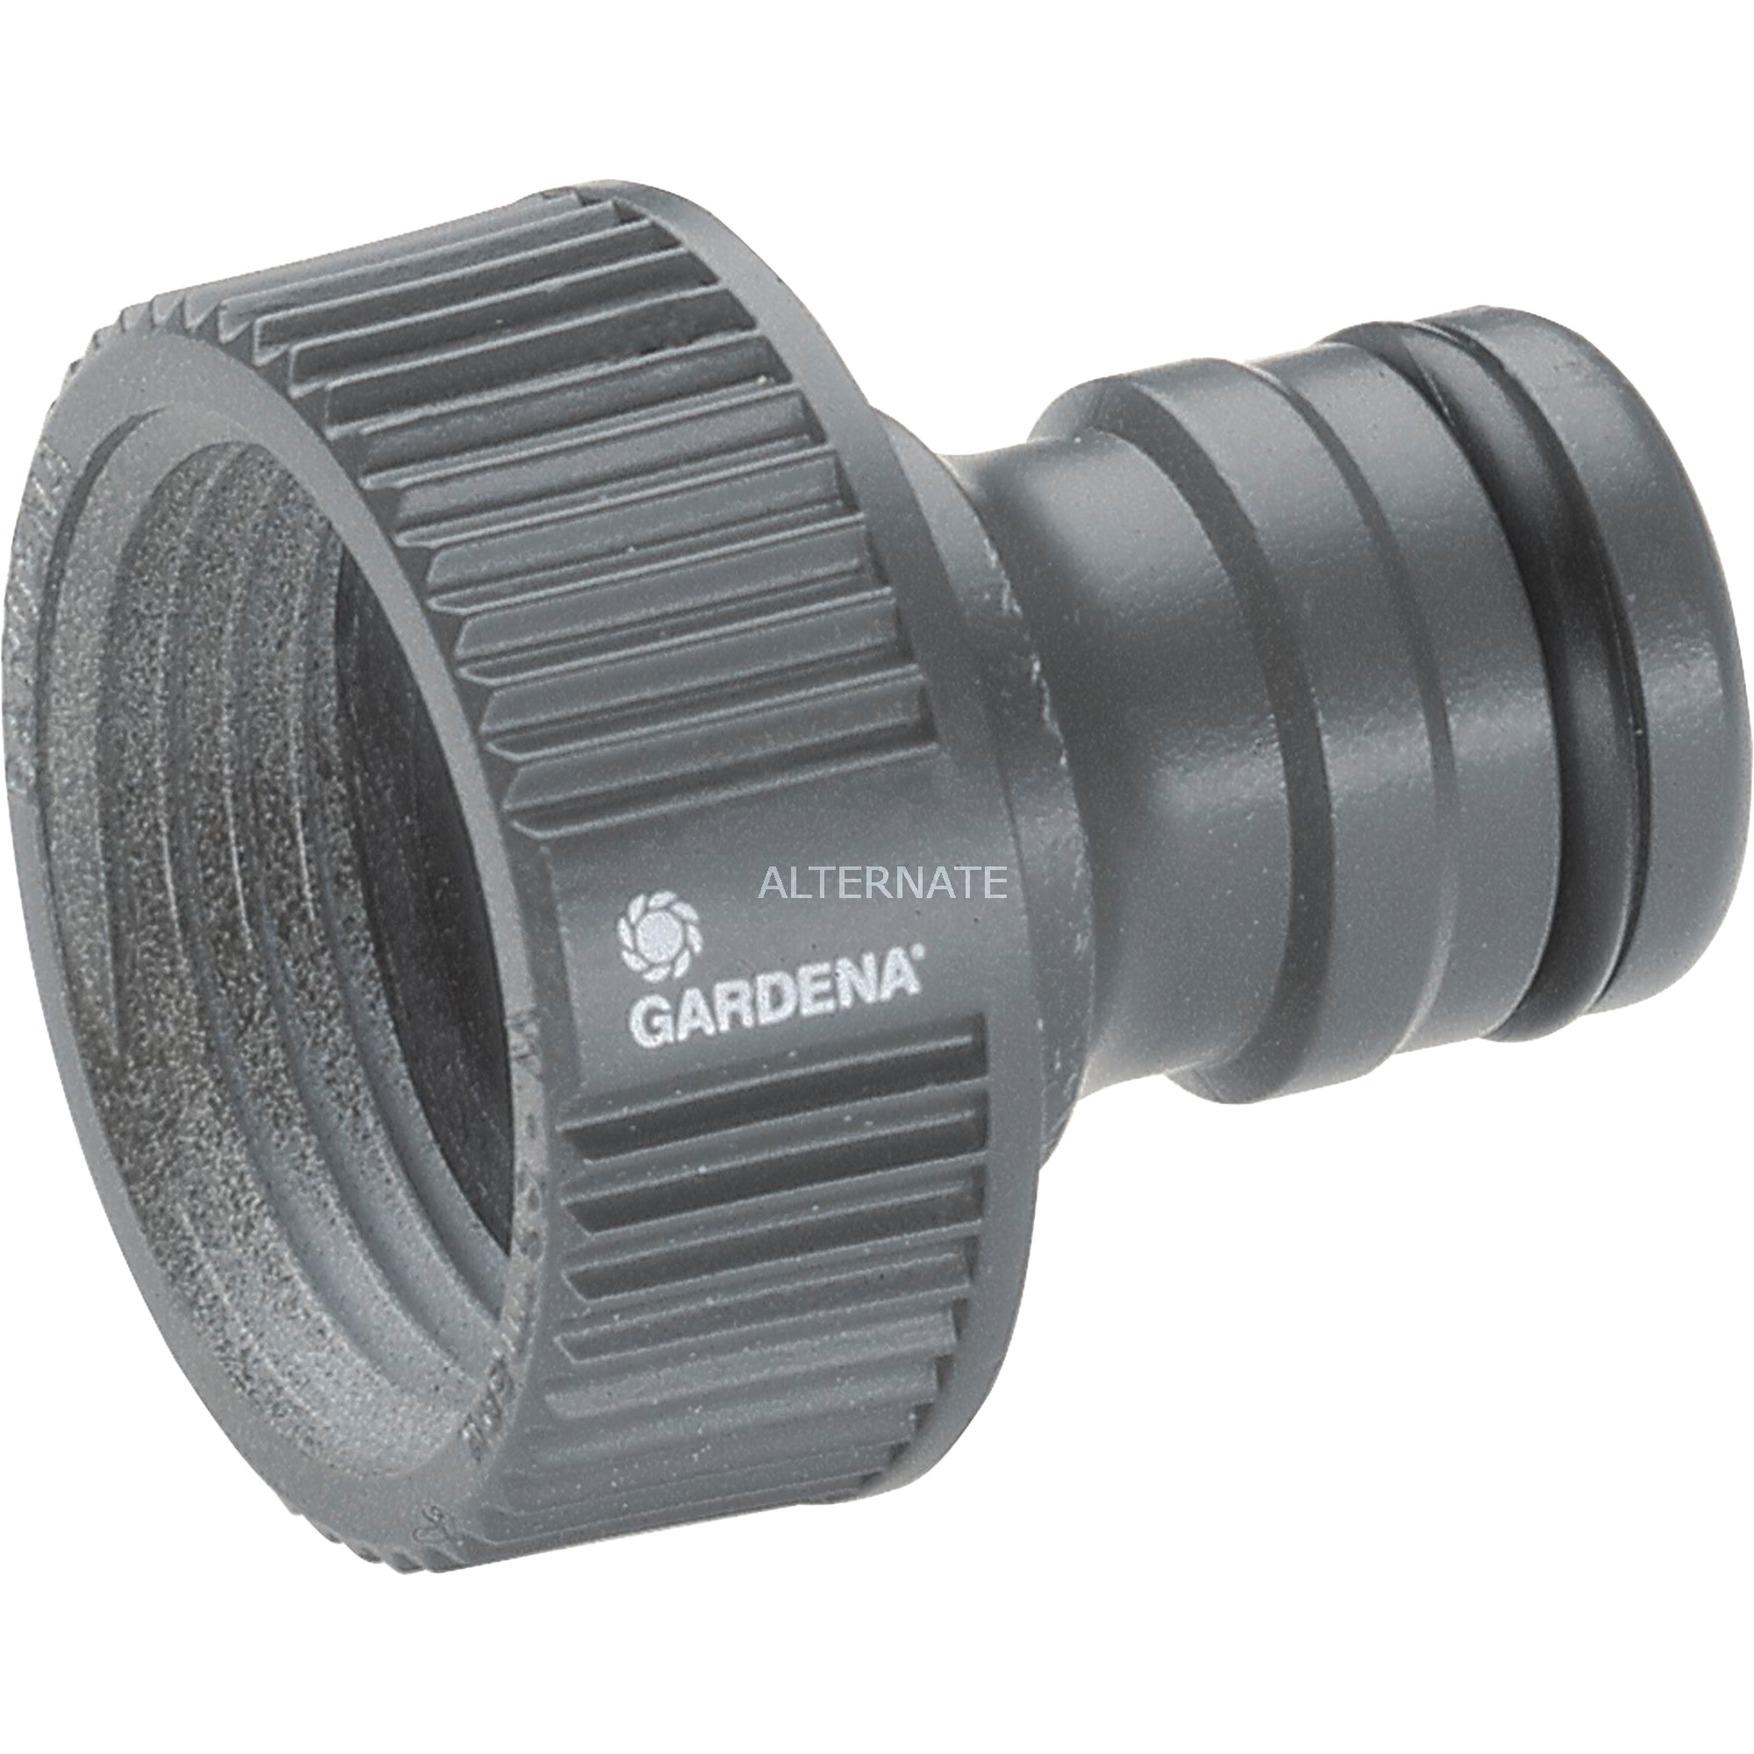 02802-20-graa-1stykker-vandslange-beslag-ventil-stykker